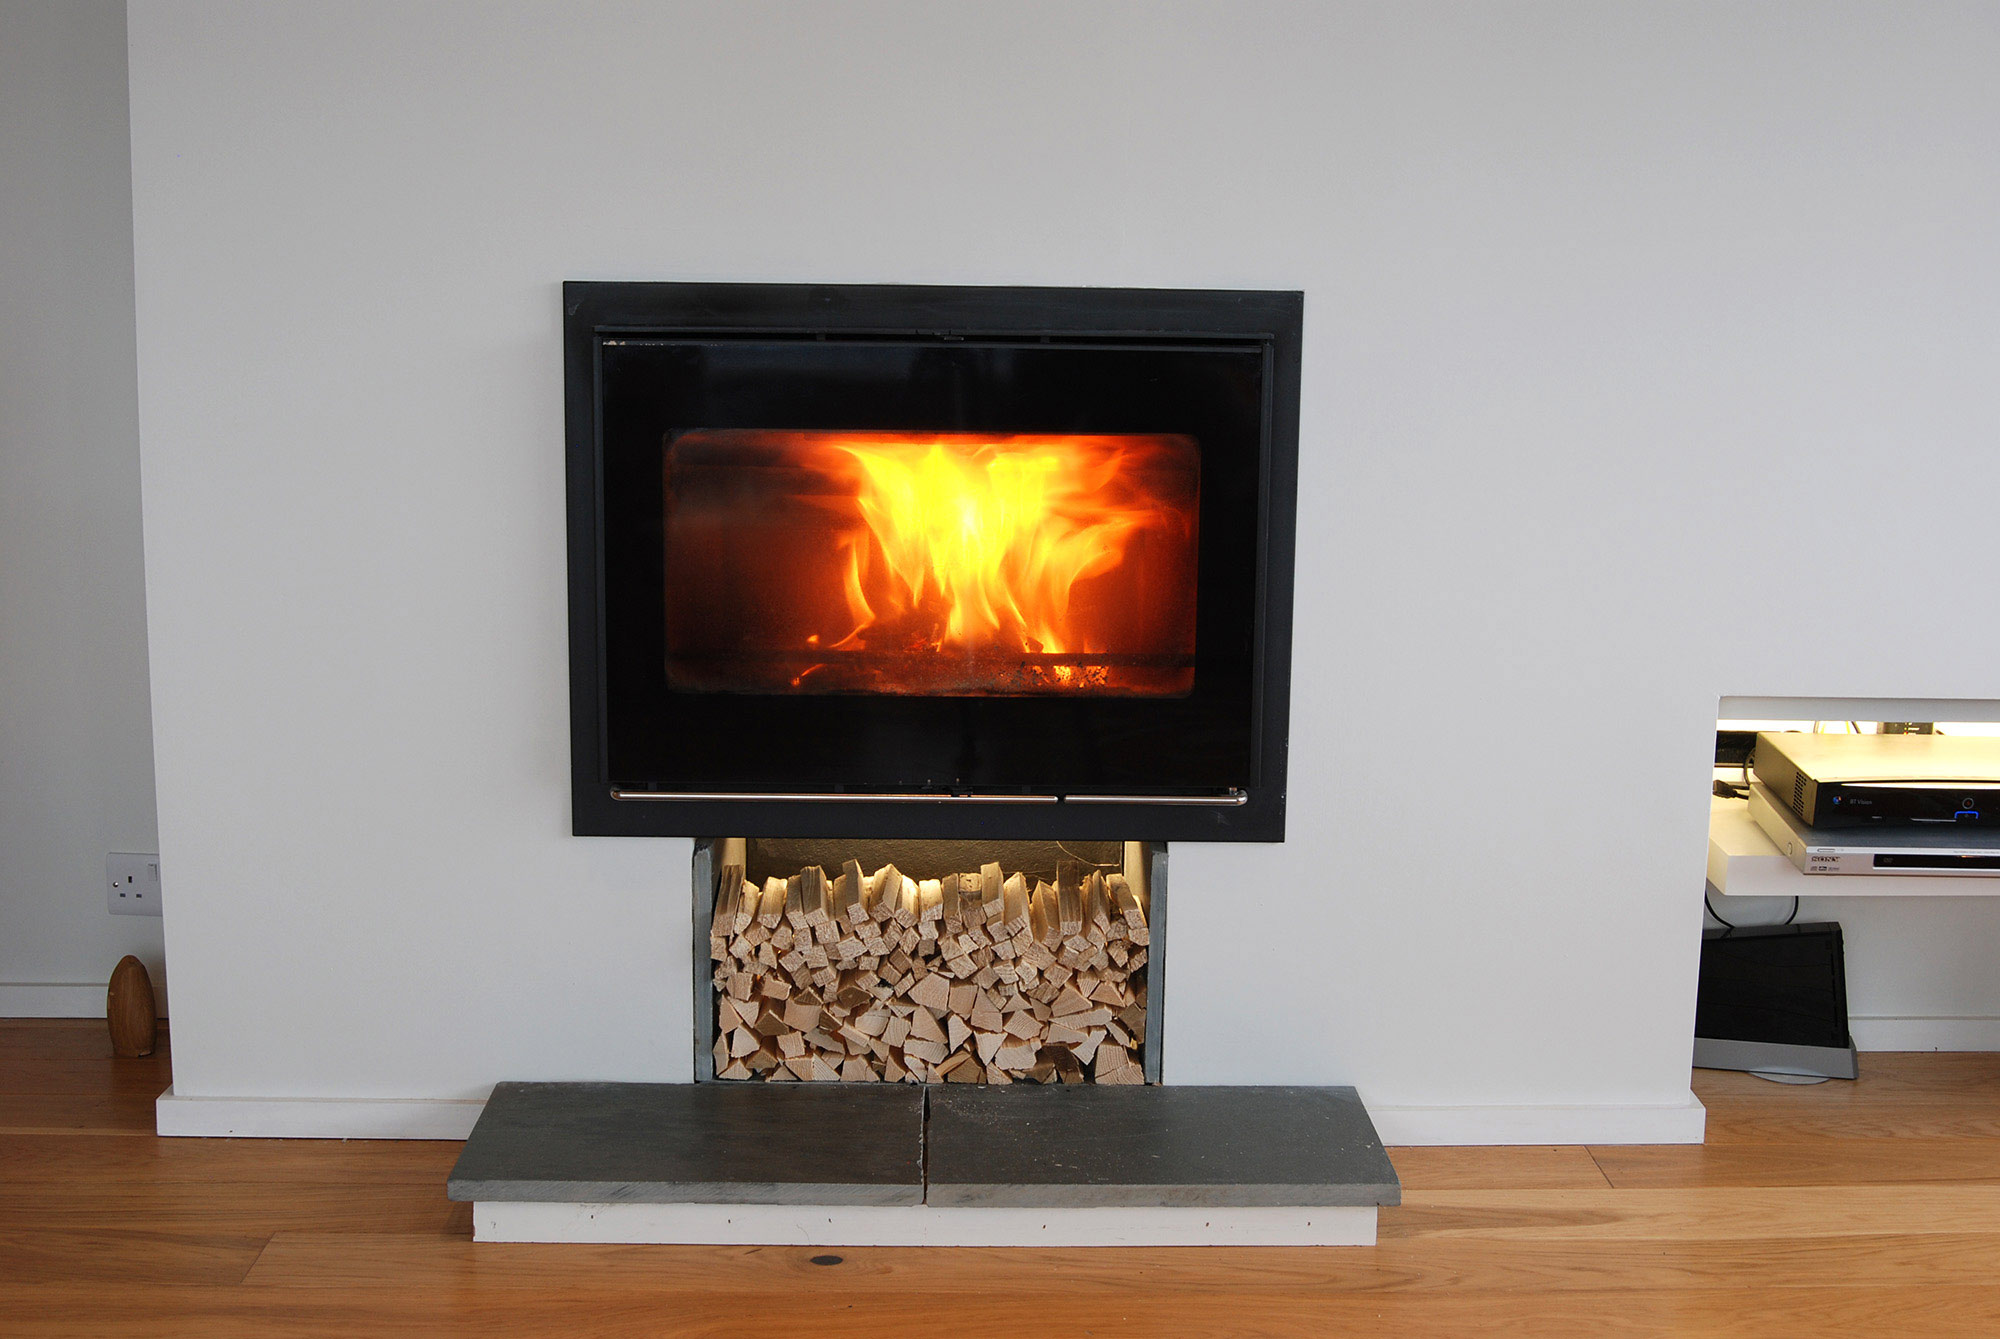 Building Modernization at Gwelanmor fireplace